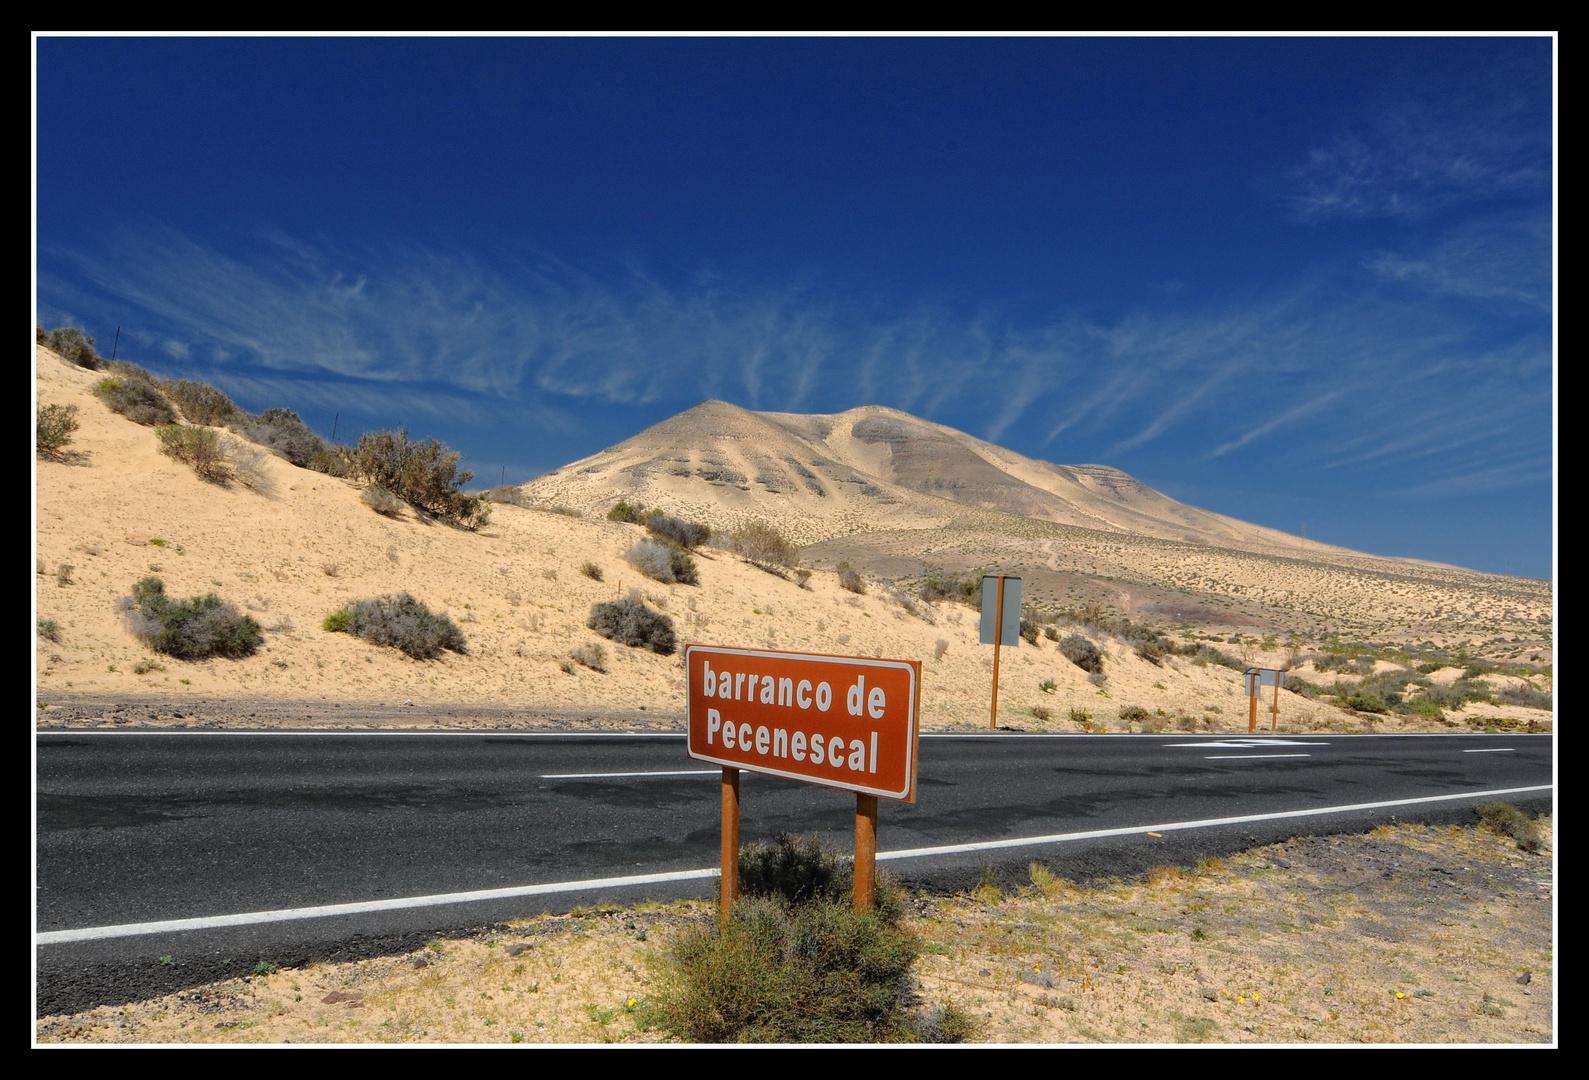 Fuerteventura - barranco de Pecenescal